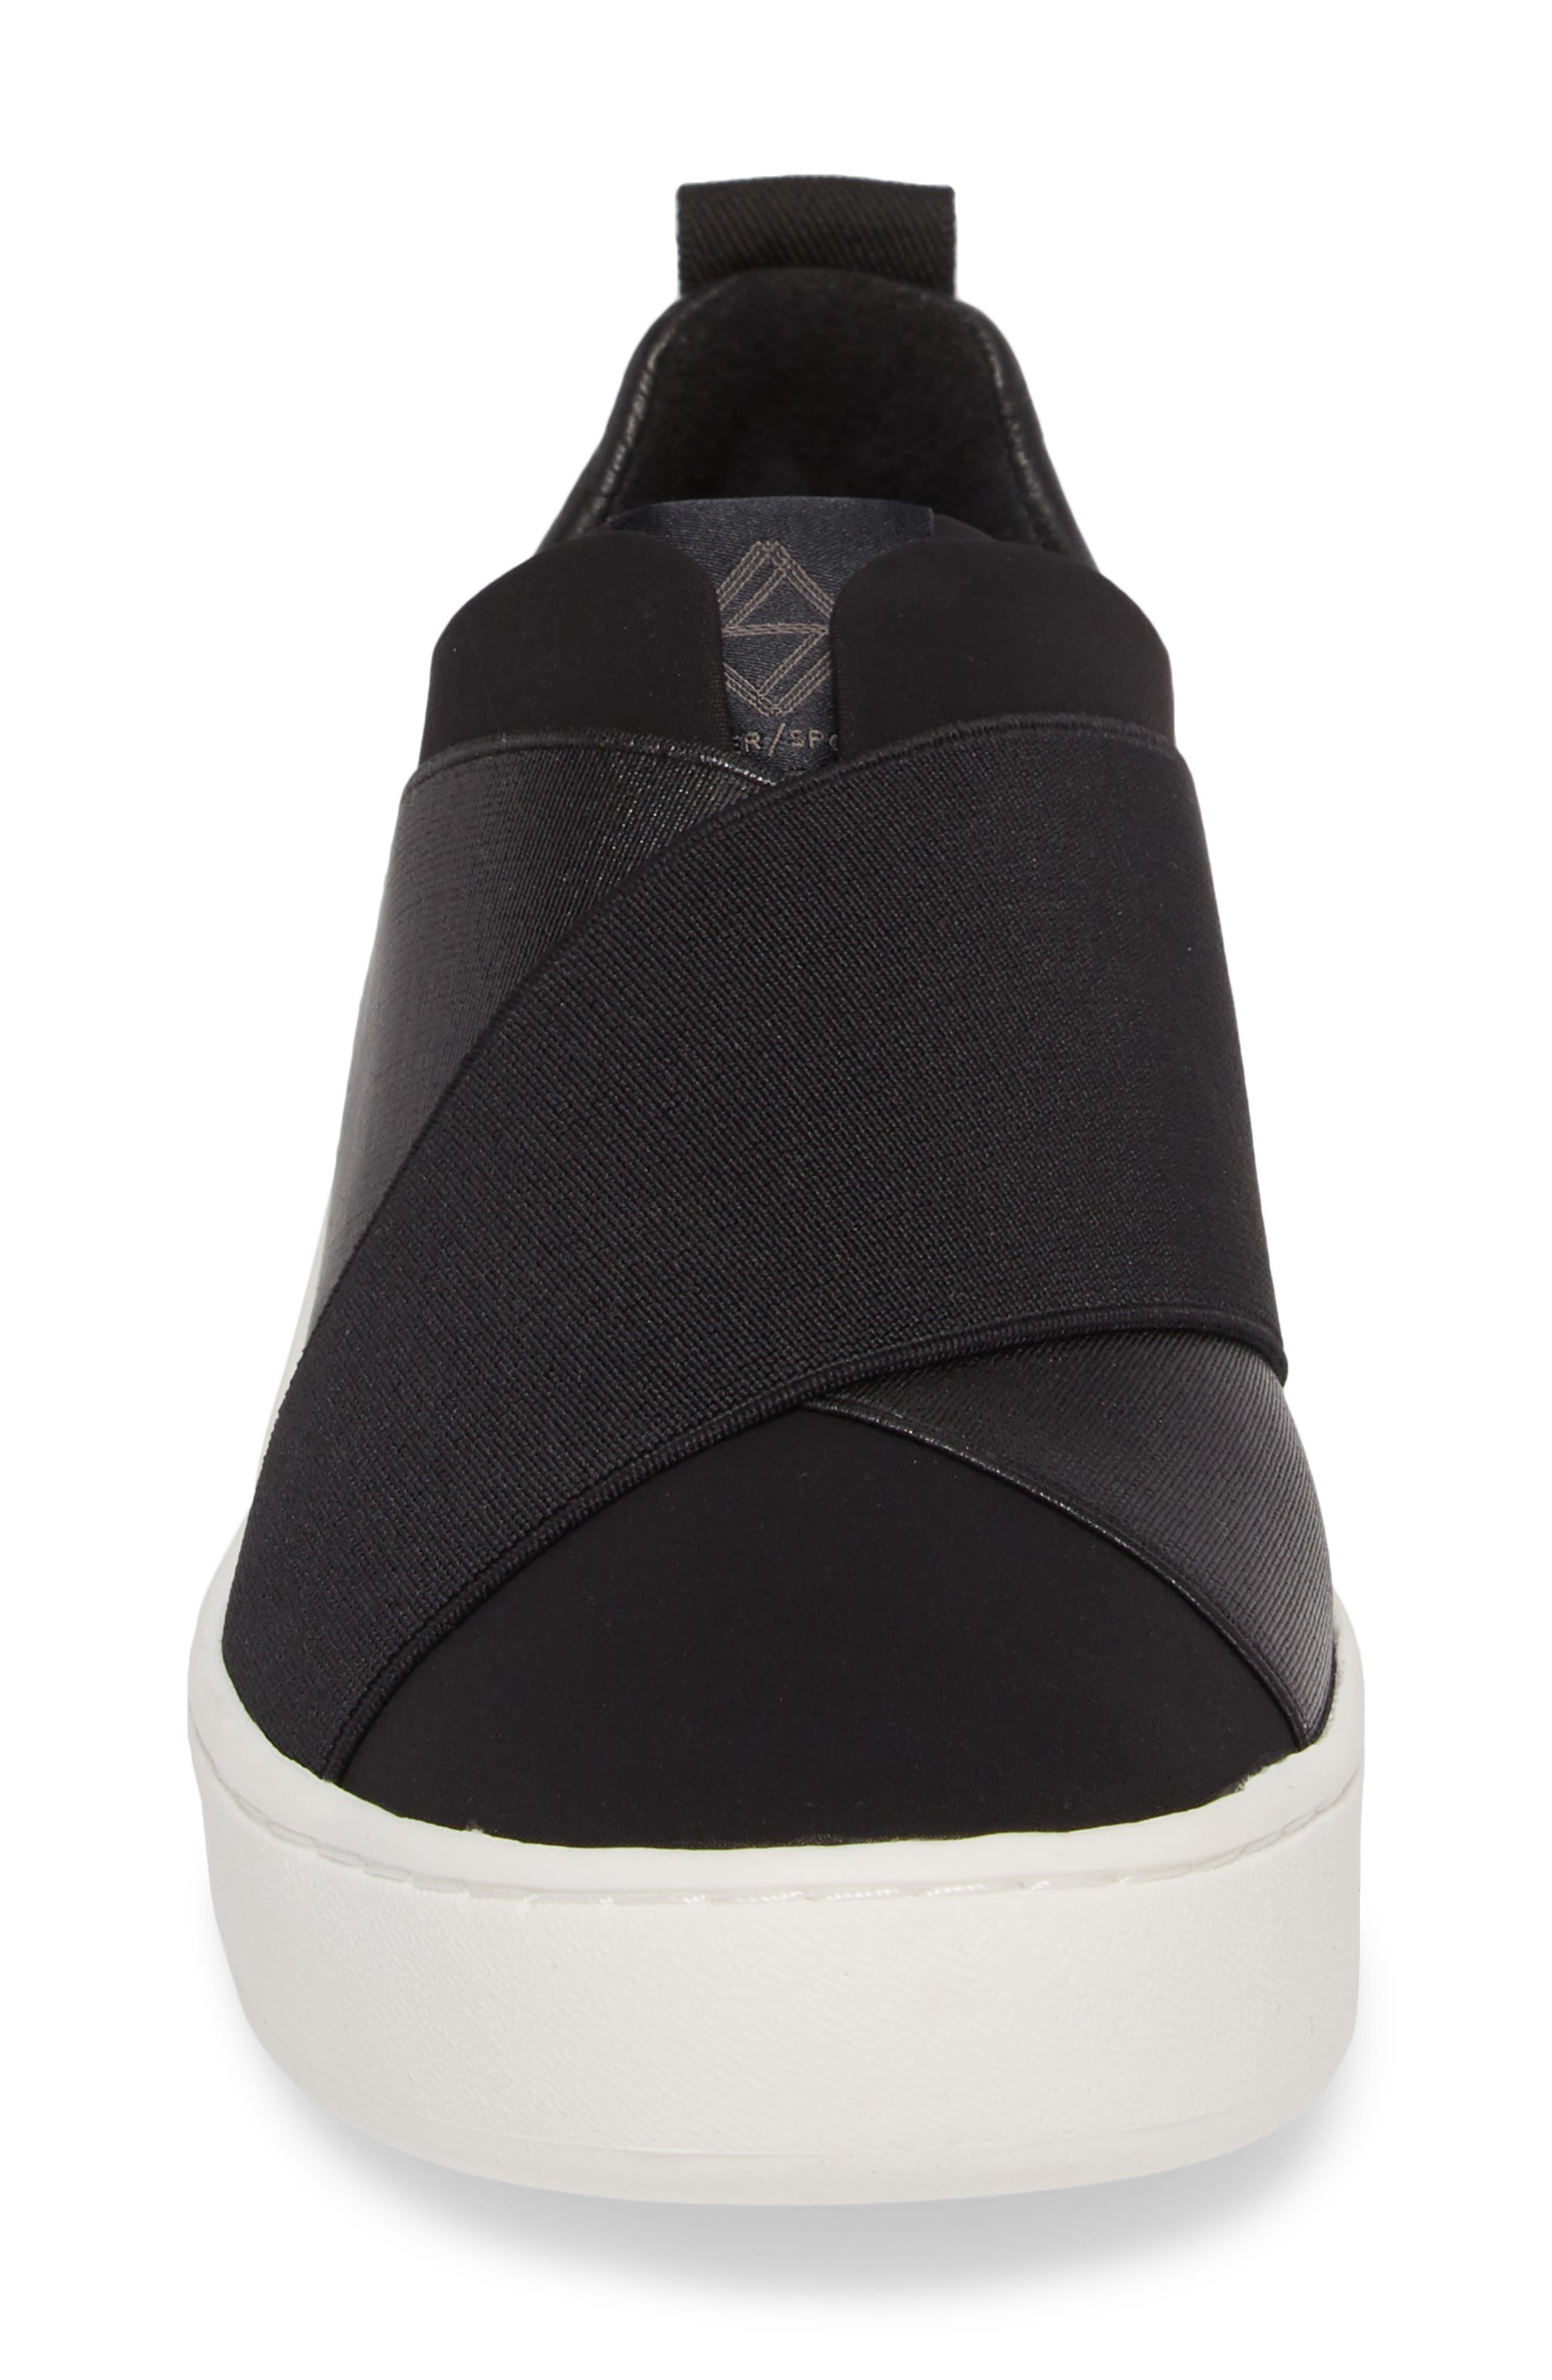 Coley Platform Slip-On Sneaker,                             Alternate thumbnail 4, color,                             BLACK LEATHER